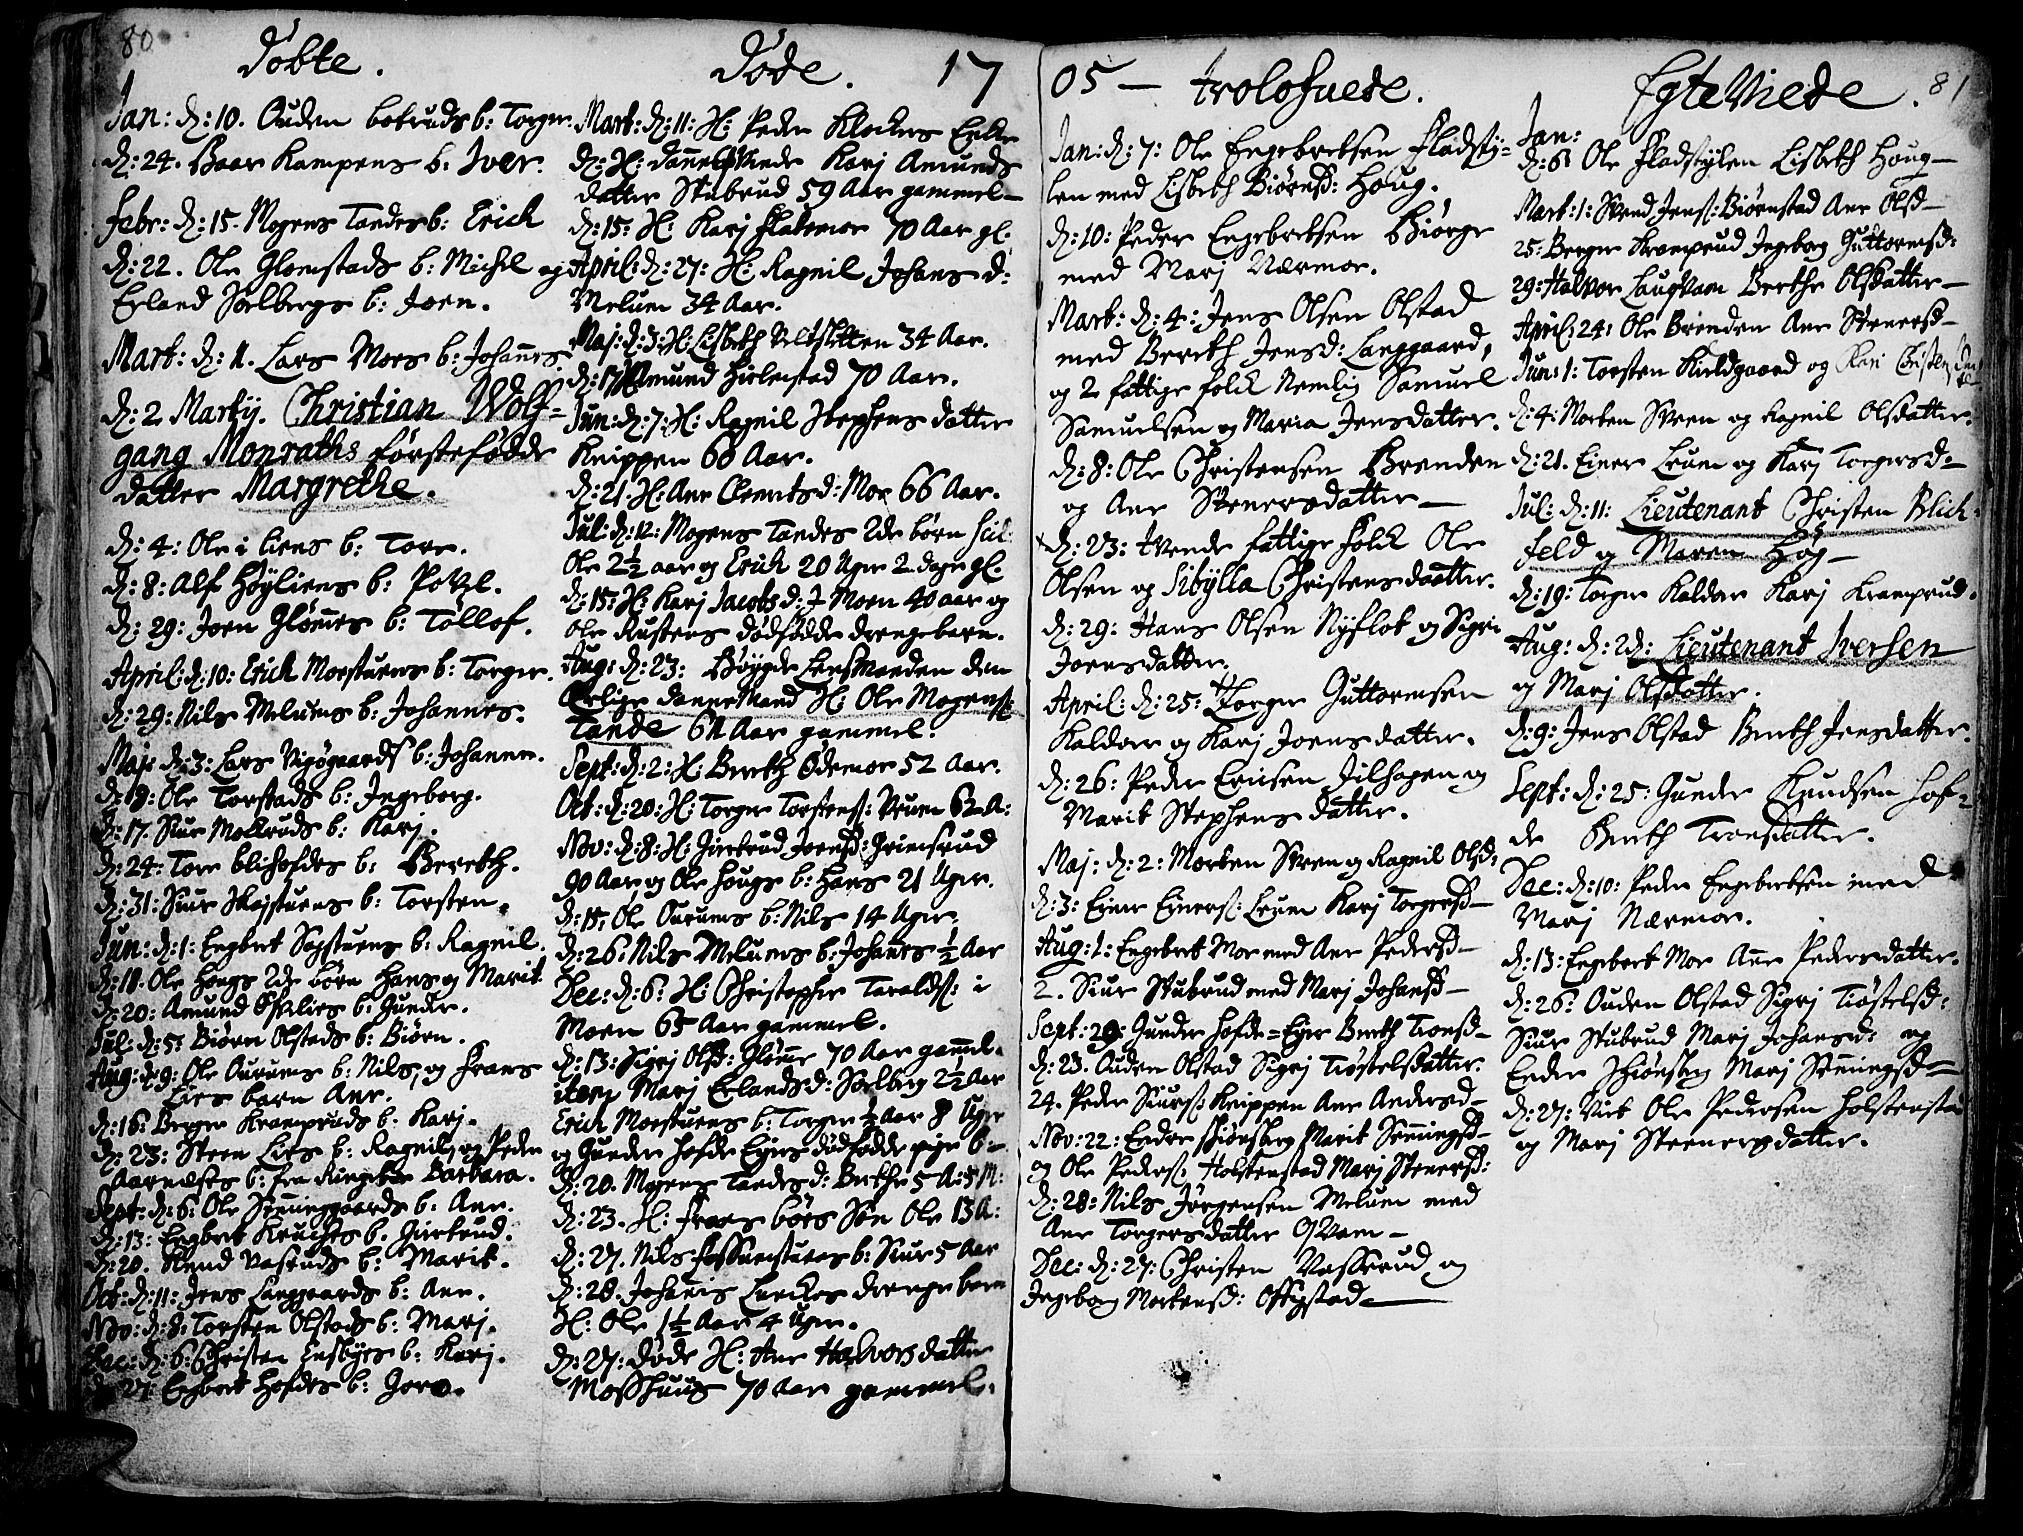 SAH, Øyer prestekontor, Ministerialbok nr. 1, 1671-1727, s. 80-81